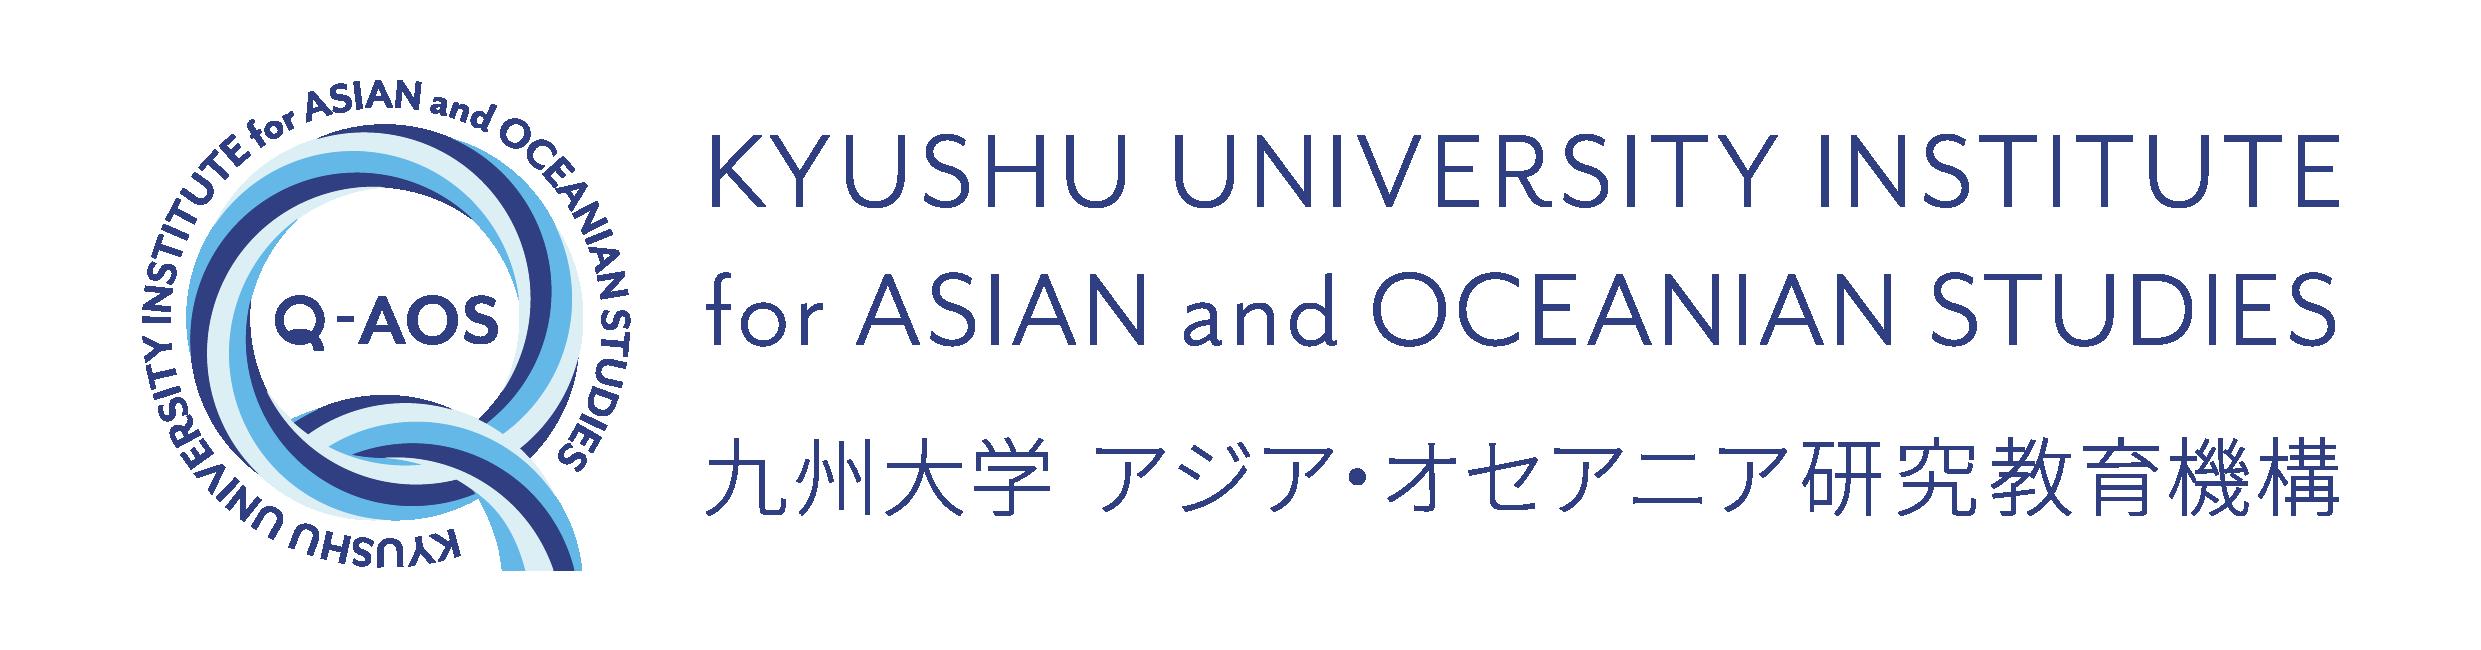 Kyushu University Institute for Asian and Oceanian Studies